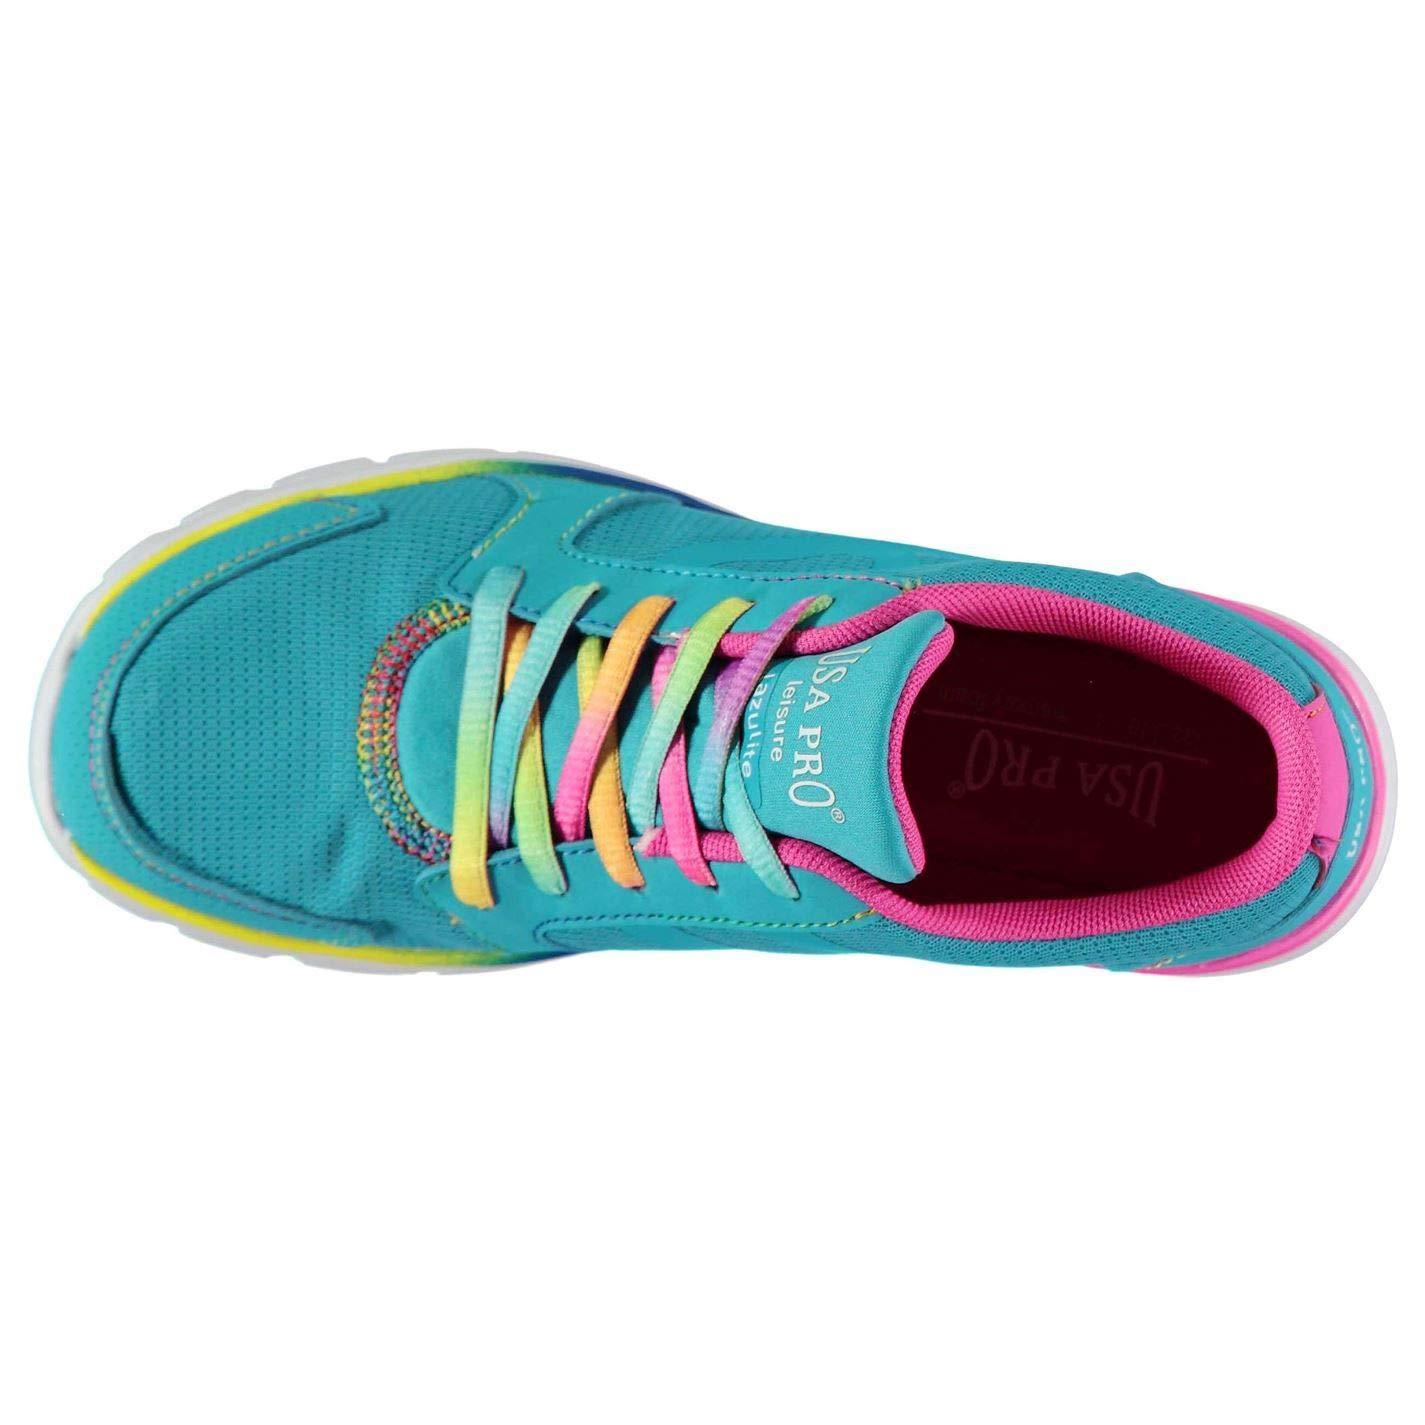 7d805a9390bd5 Amazon.com: USA Pro Lazulite Trainers Girls Blue Shoes Footwear (UK5 ...